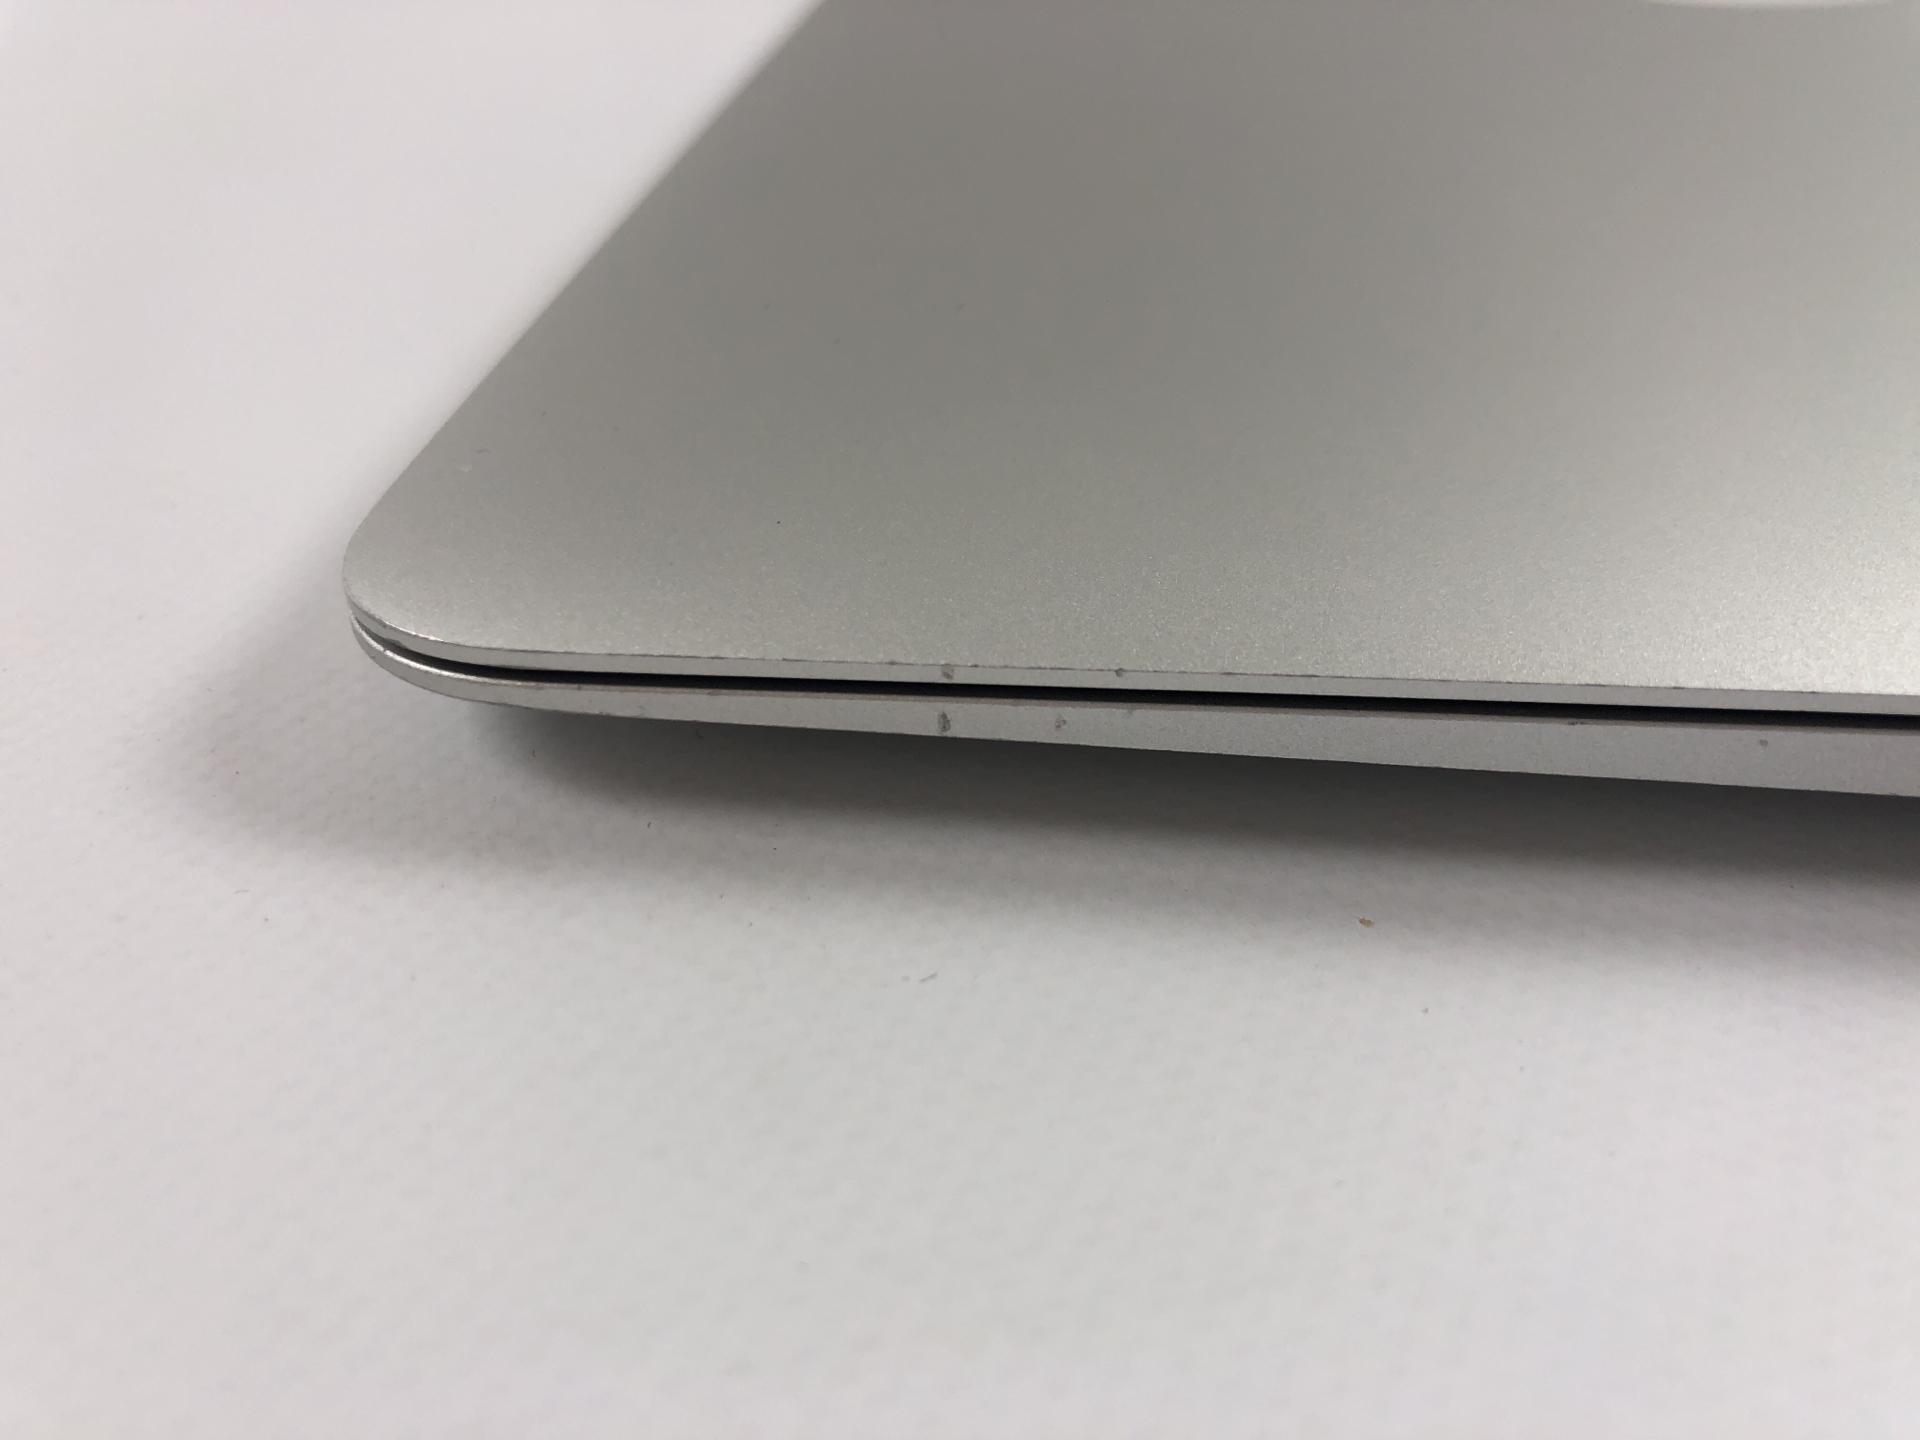 "MacBook Air 13"" Early 2015 (Intel Core i5 1.6 GHz 8 GB RAM 128 GB SSD), Intel Core i5 1.6 GHz, 8 GB RAM, 128 GB SSD, Afbeelding 4"